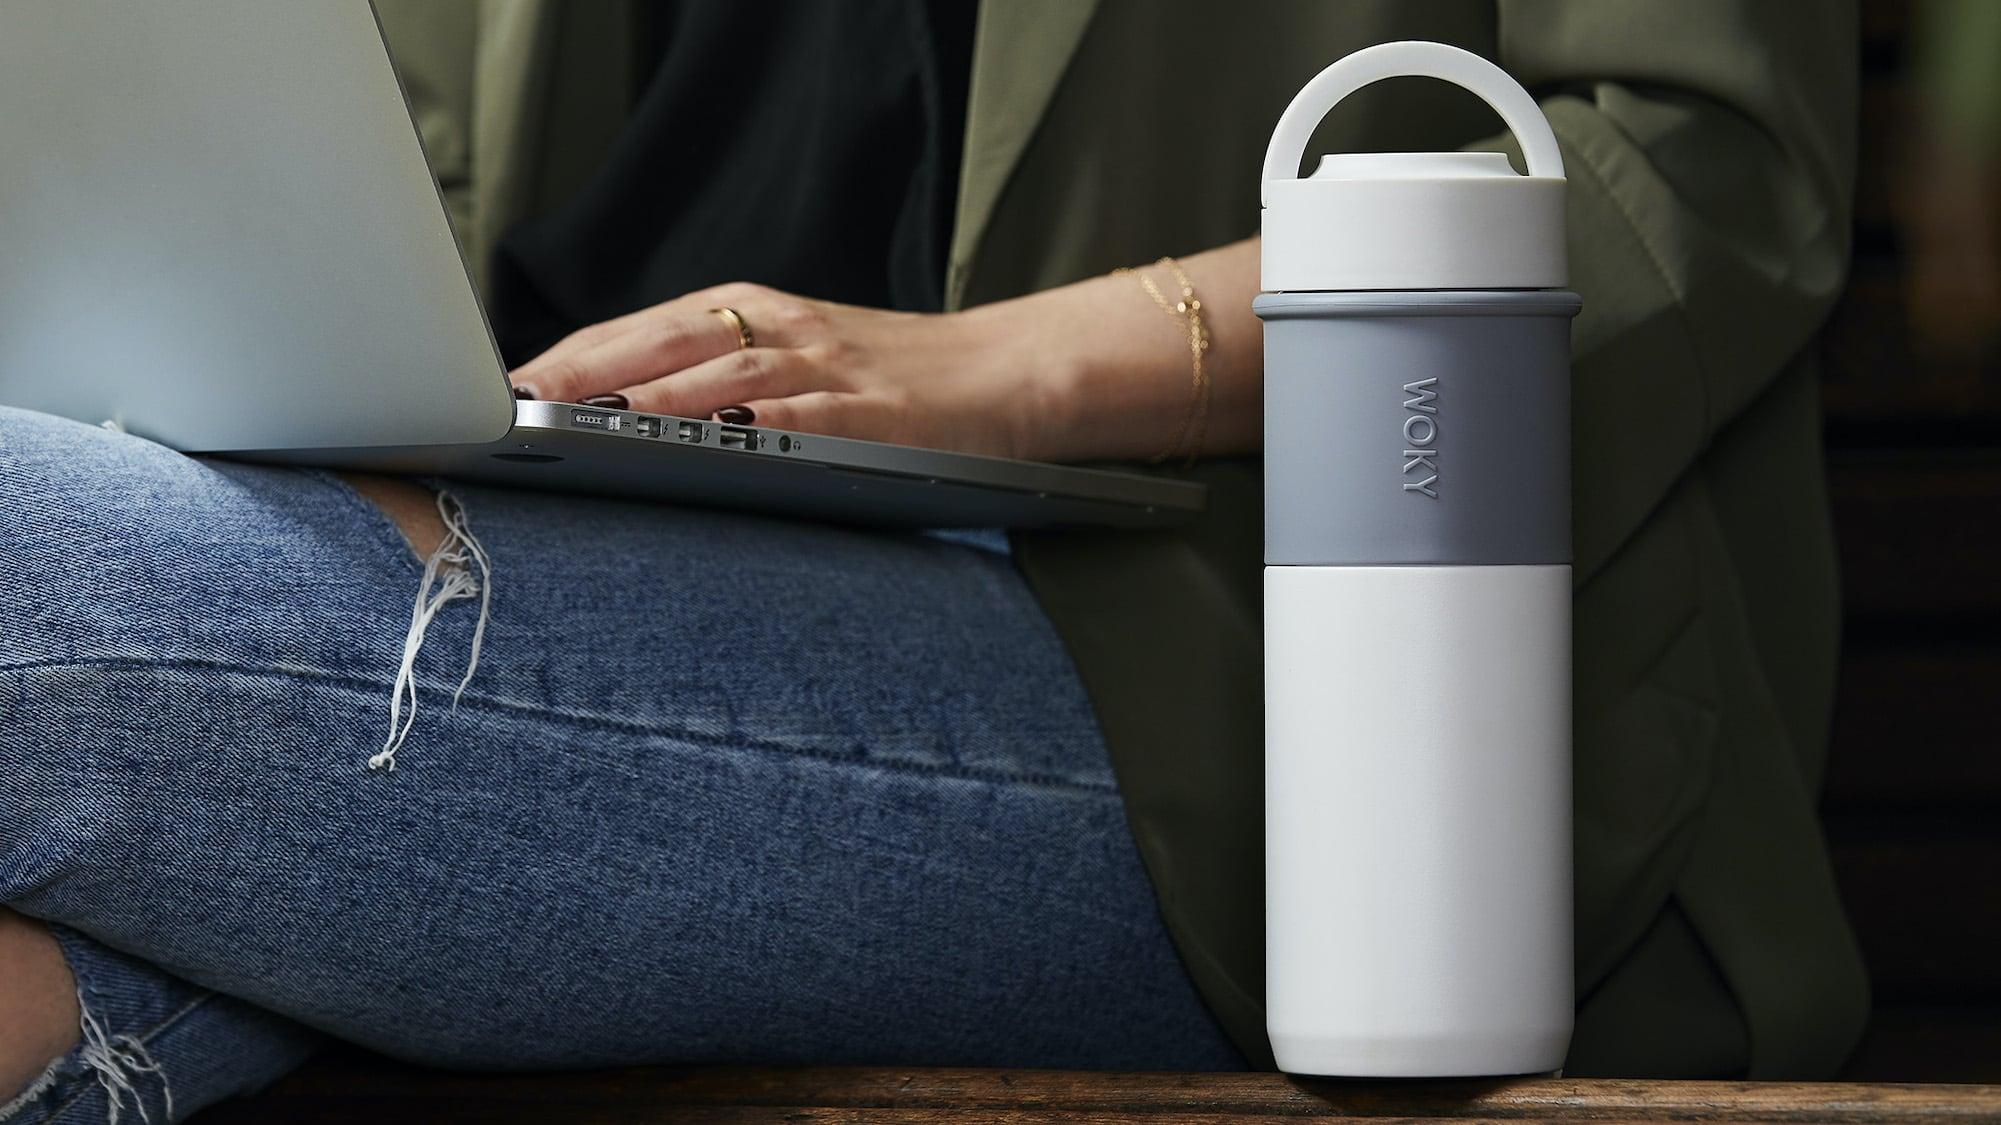 WOKY Bottle Leakproof Ceramic Thermos won't leave a nasty metallic taste